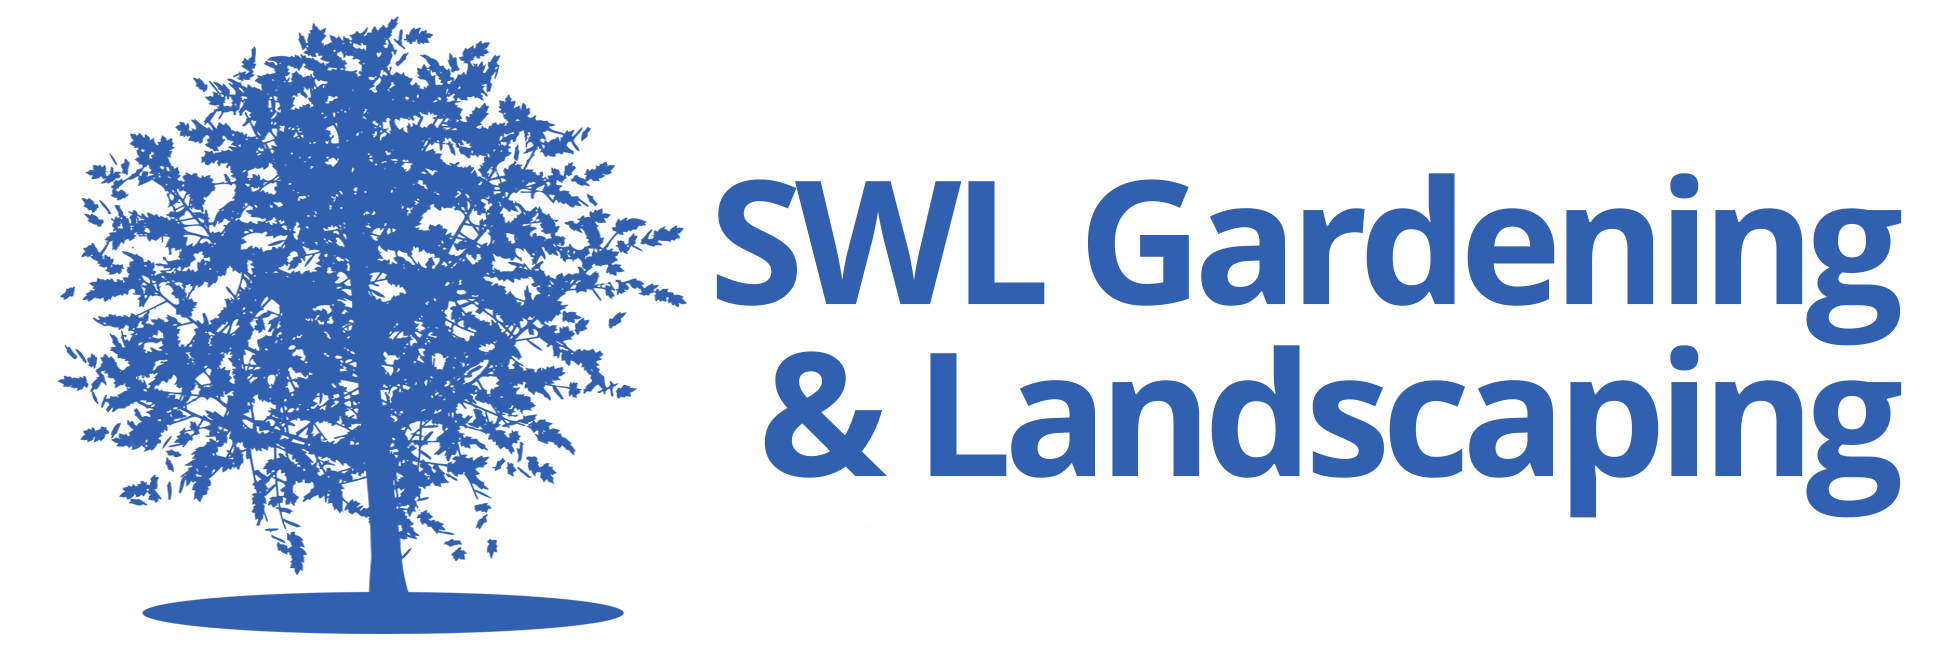 SWL Gardening & Landscaping